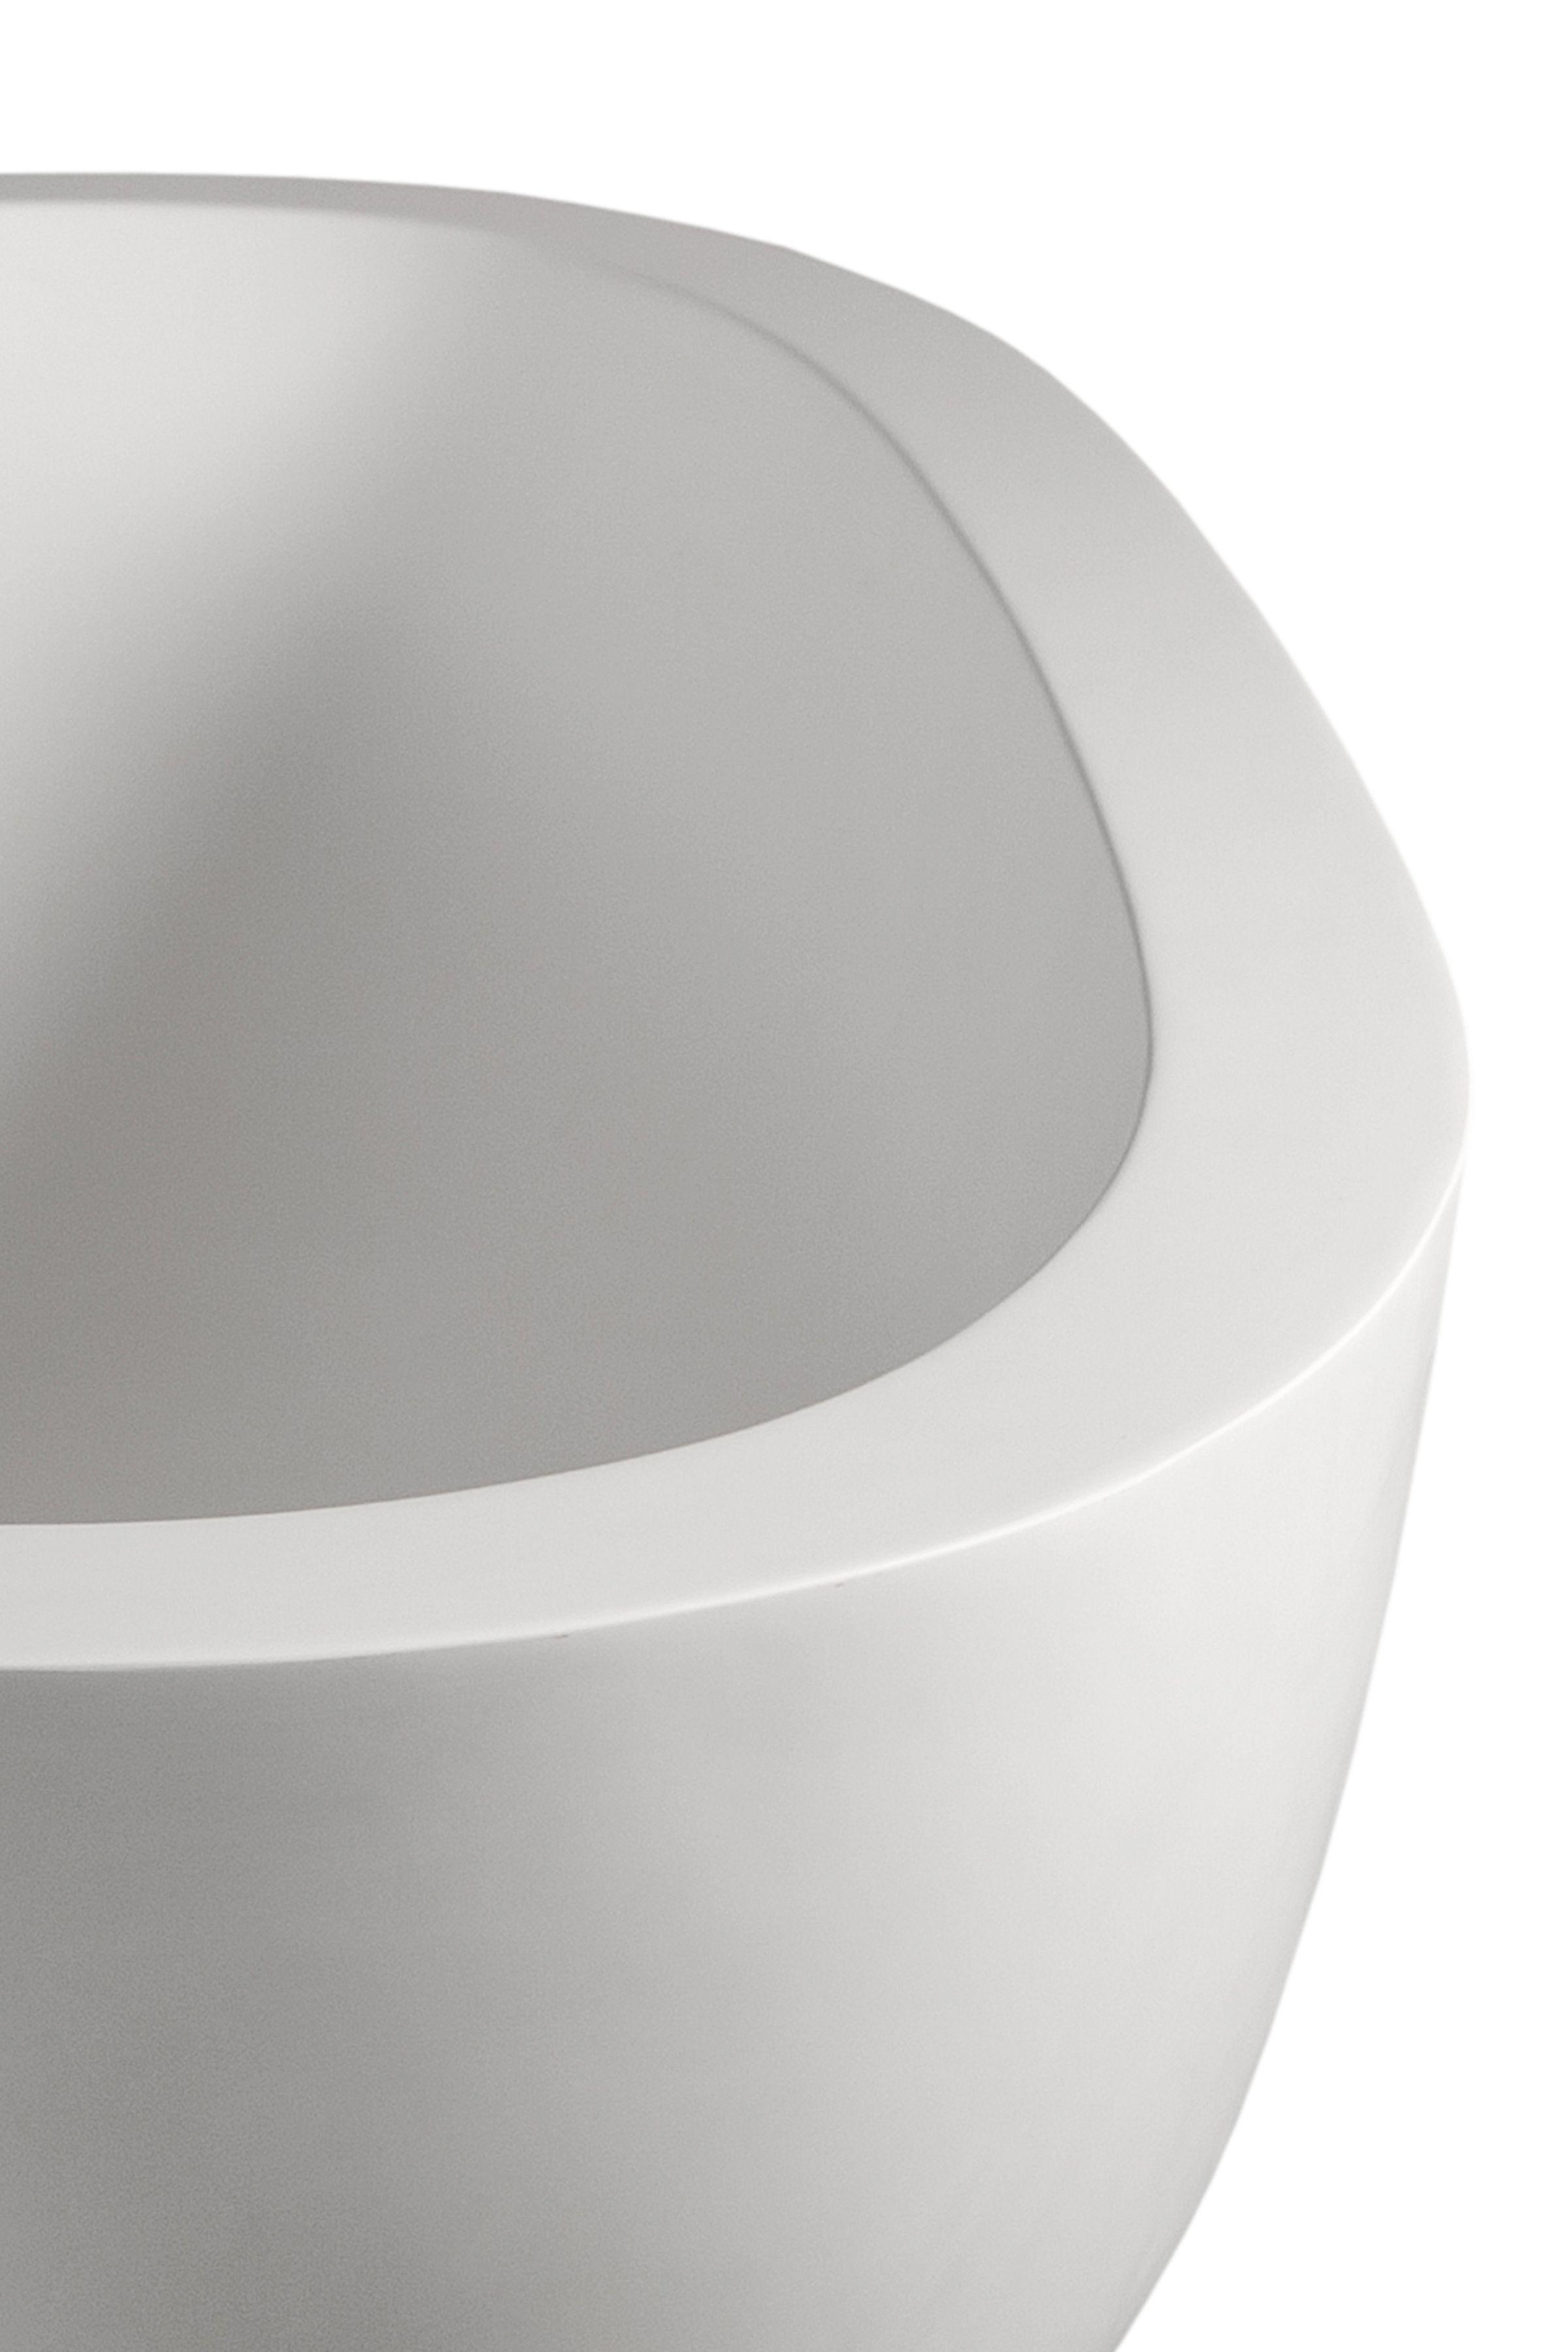 Future Classics Bathtubs And Wash Basins Are Made From Dadoquartz